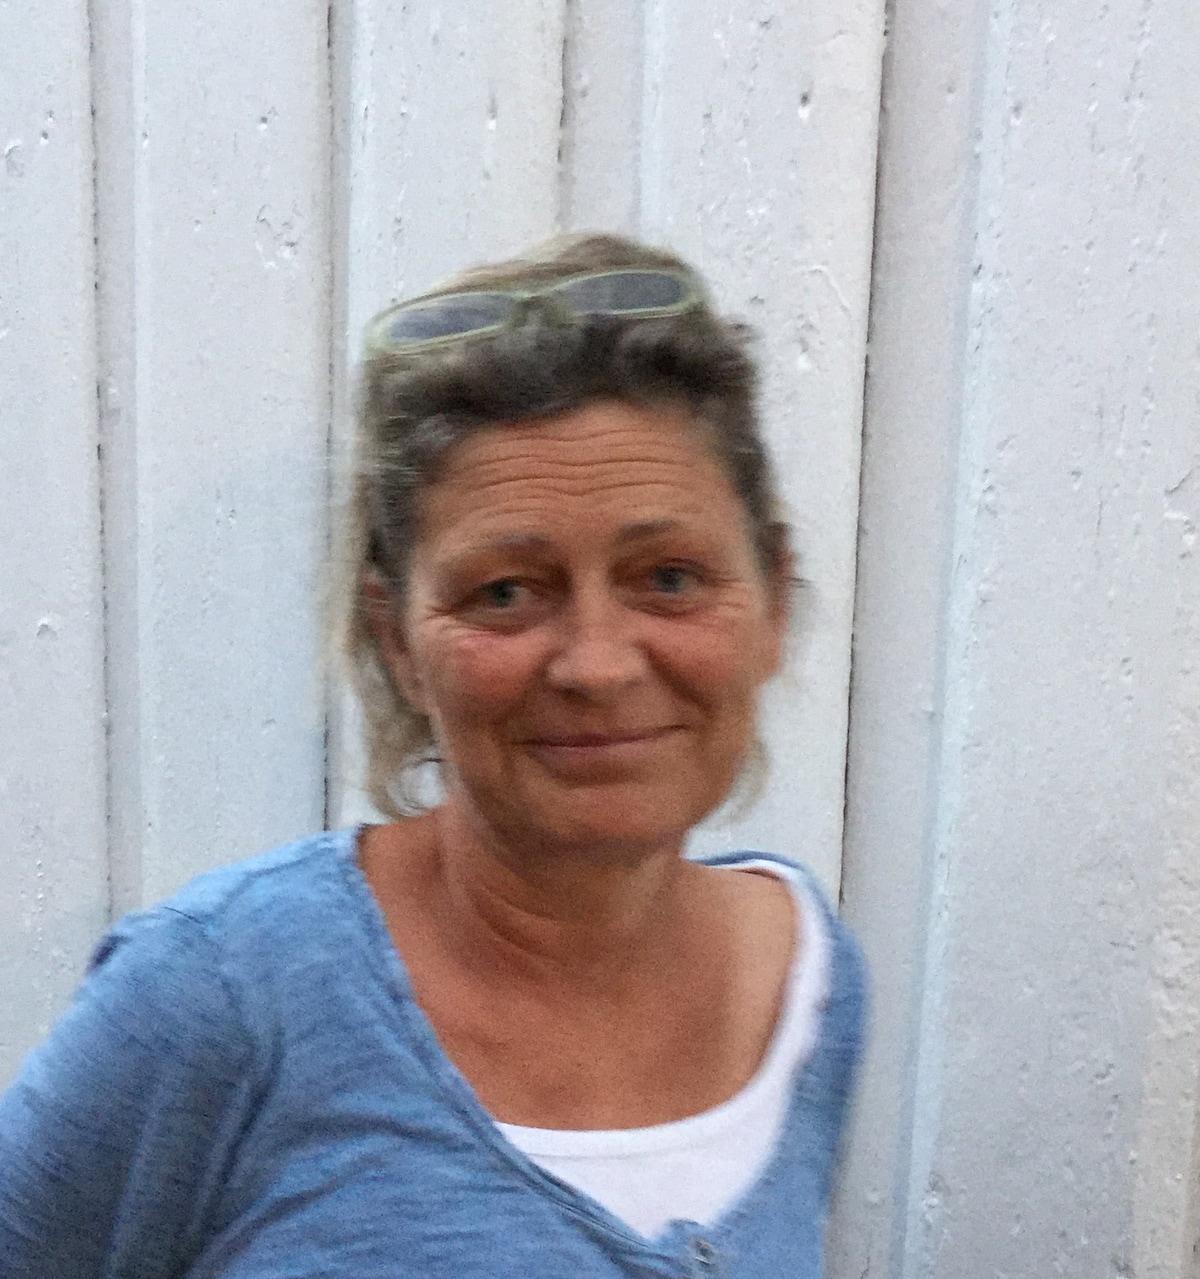 Helene From Norway